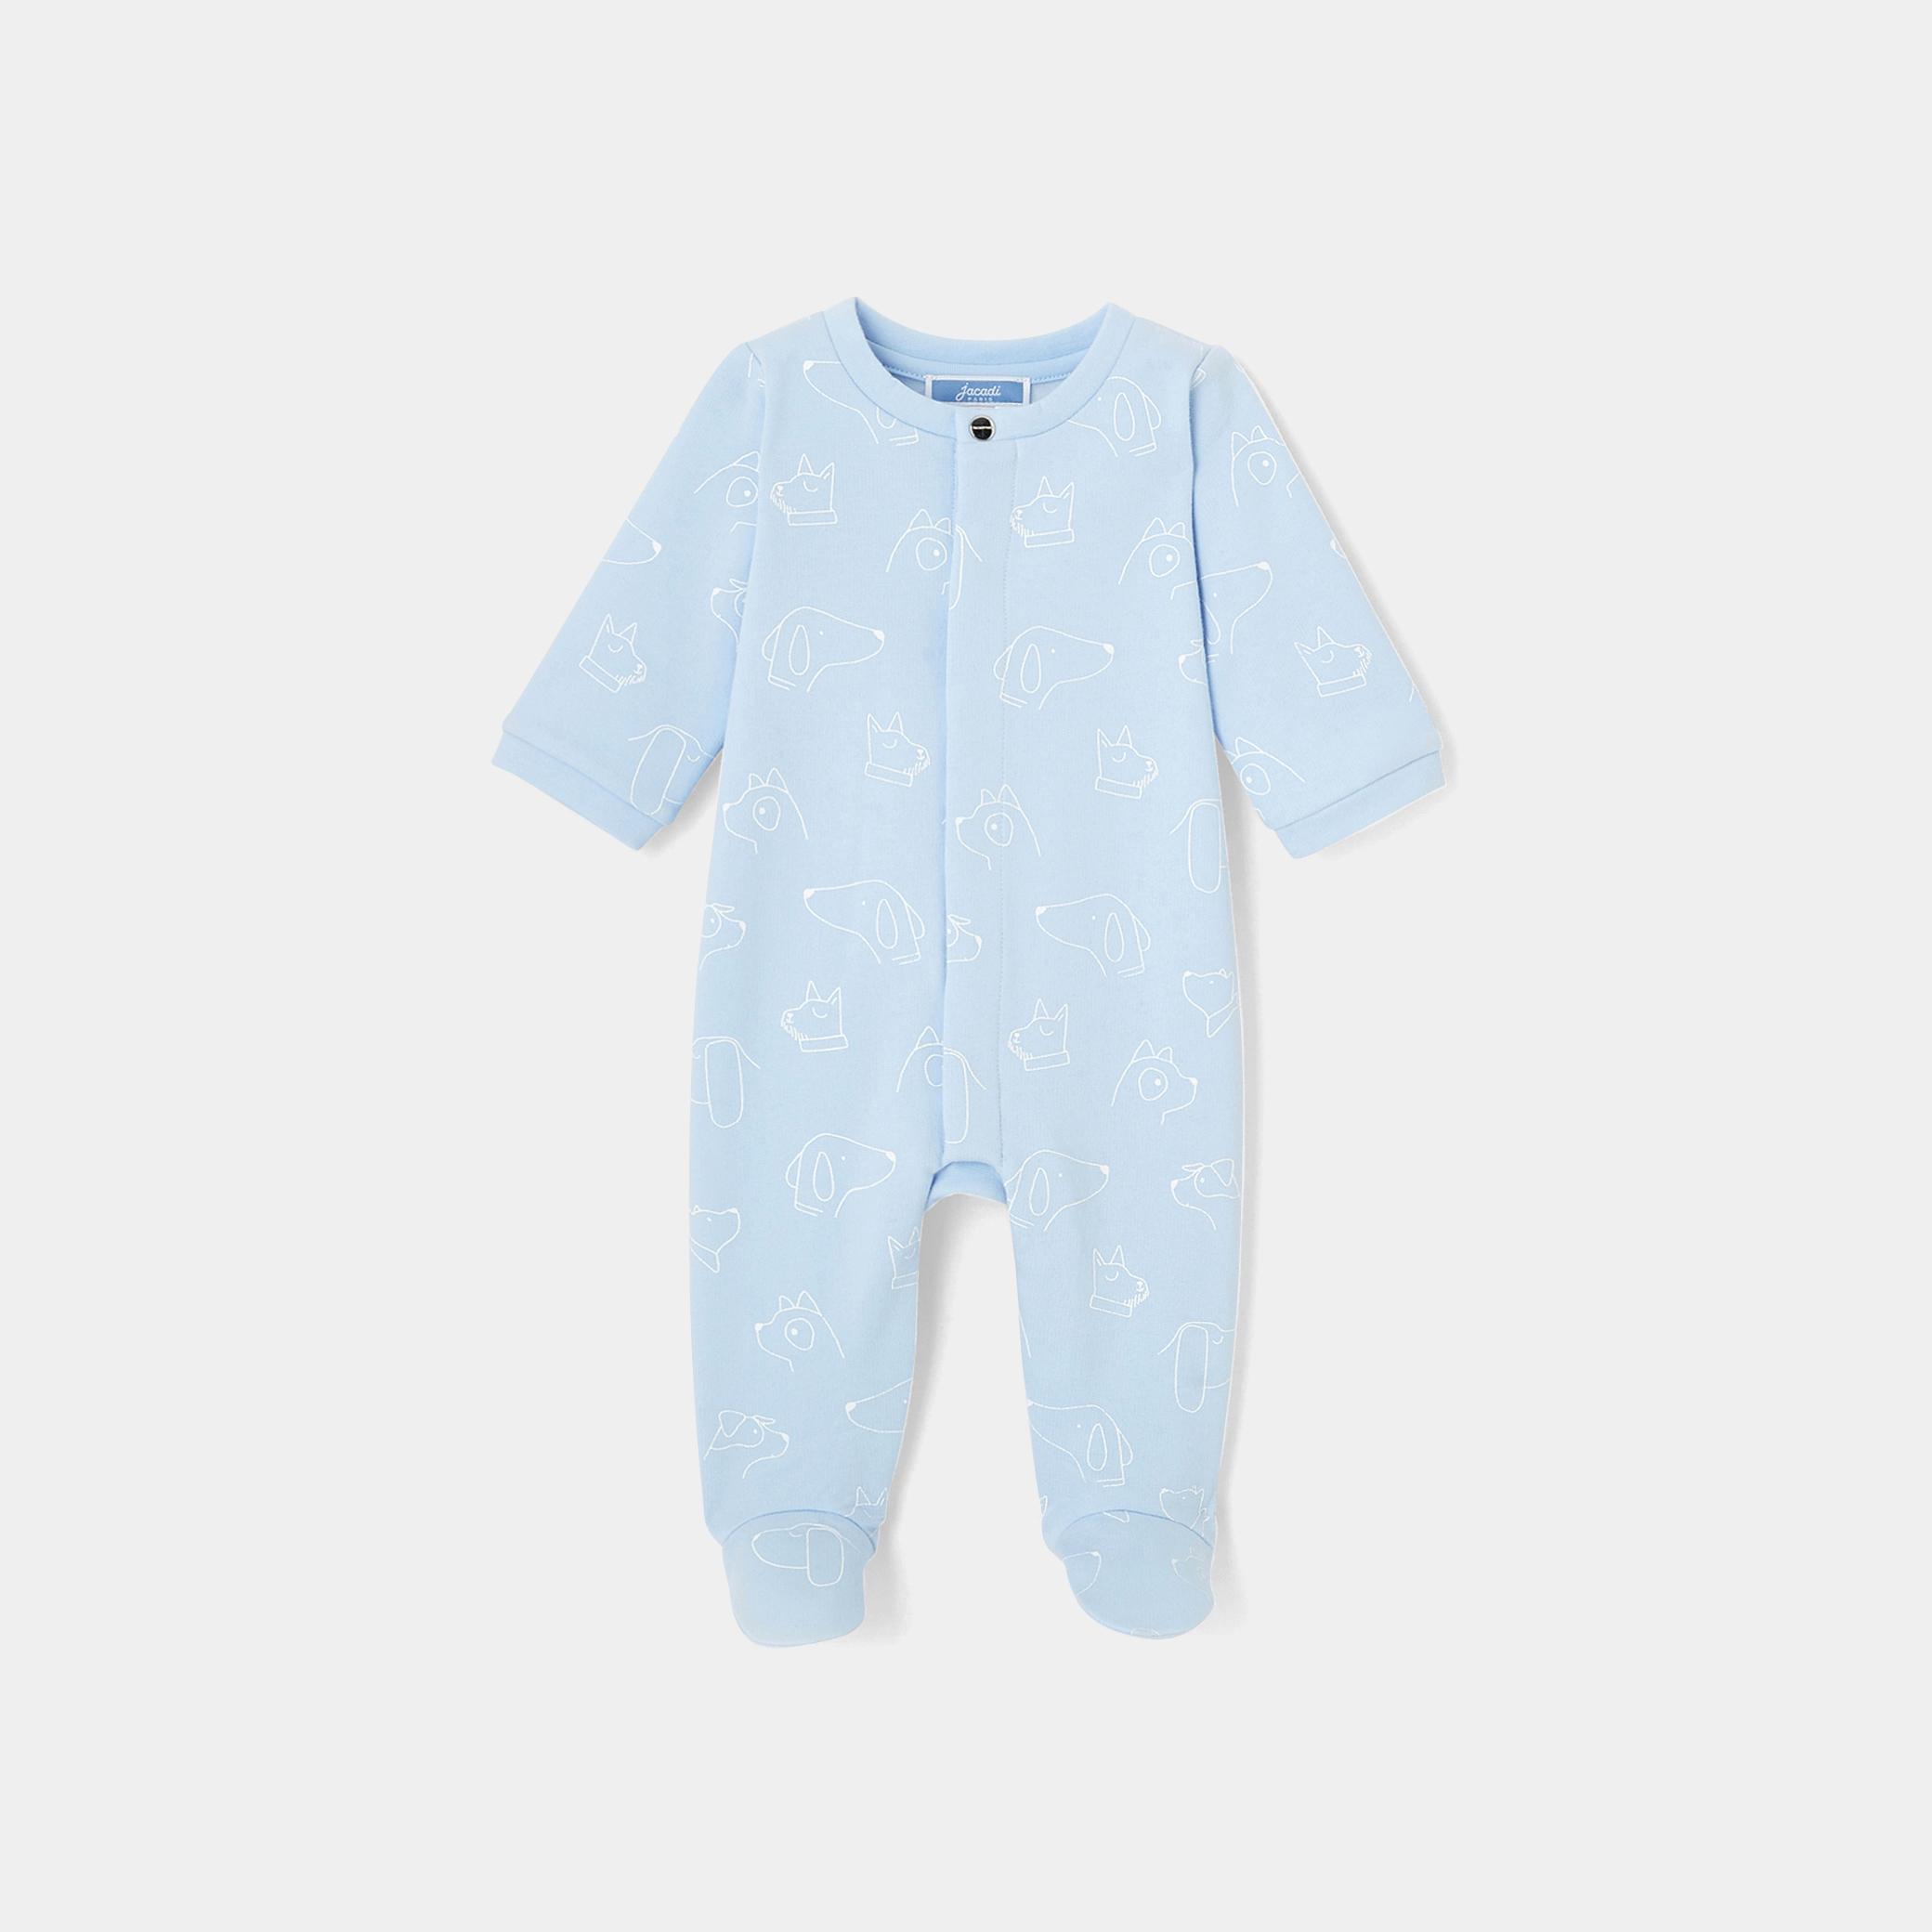 Baby boy fleece footed pajamas